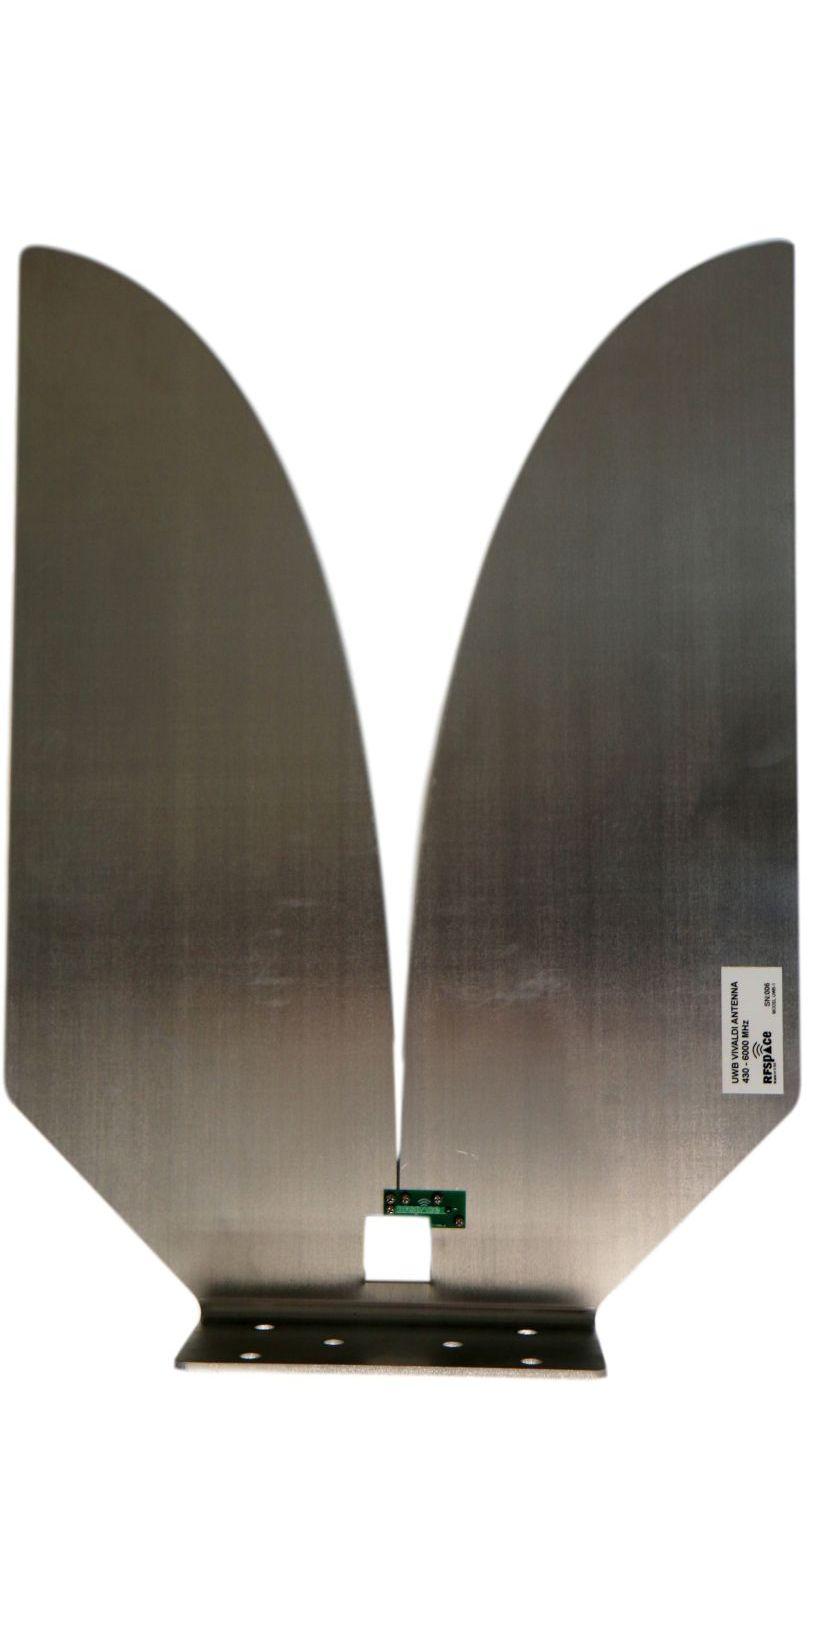 Aluminum Planar Vivaldi Horn Antenna measured far field in anechoic chamber gain results in dBi